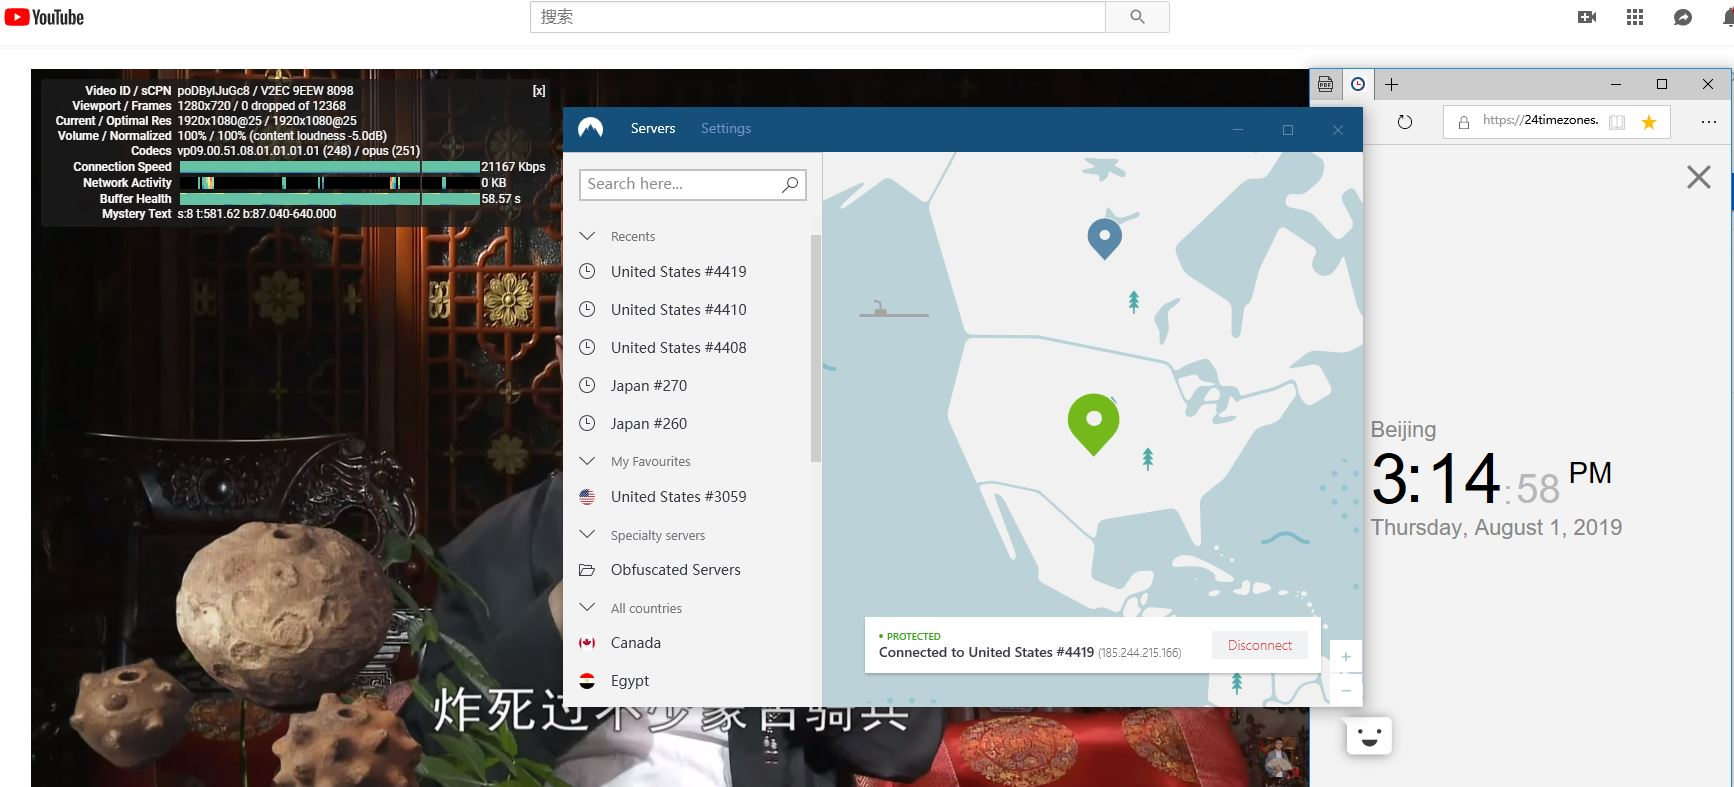 windows nordvpn UDP协议 美国4419服务器 翻墙 科学上网 YouTube速度-20190801